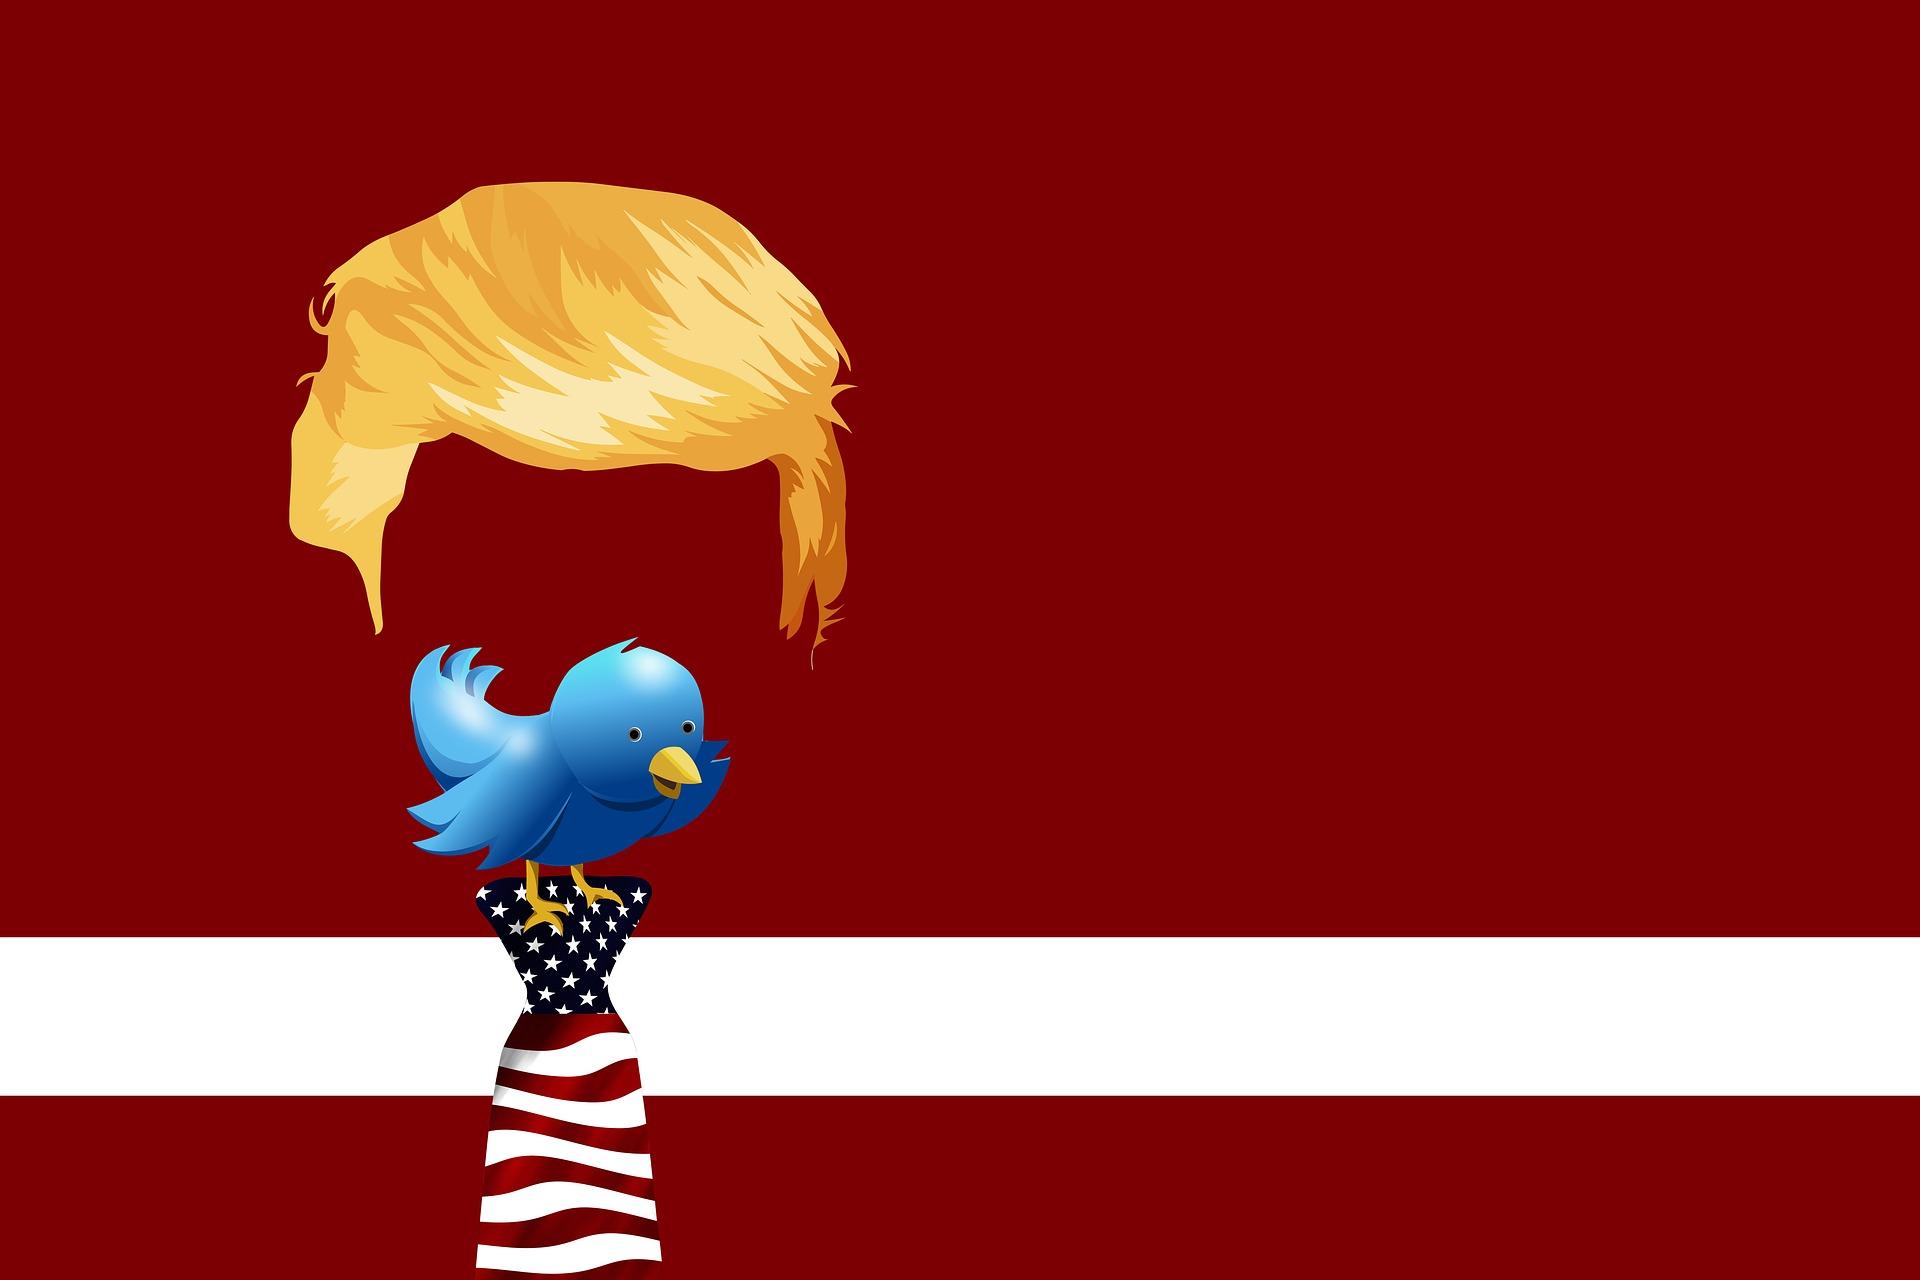 Trump's hair above a blue bird standing on an American flag tie